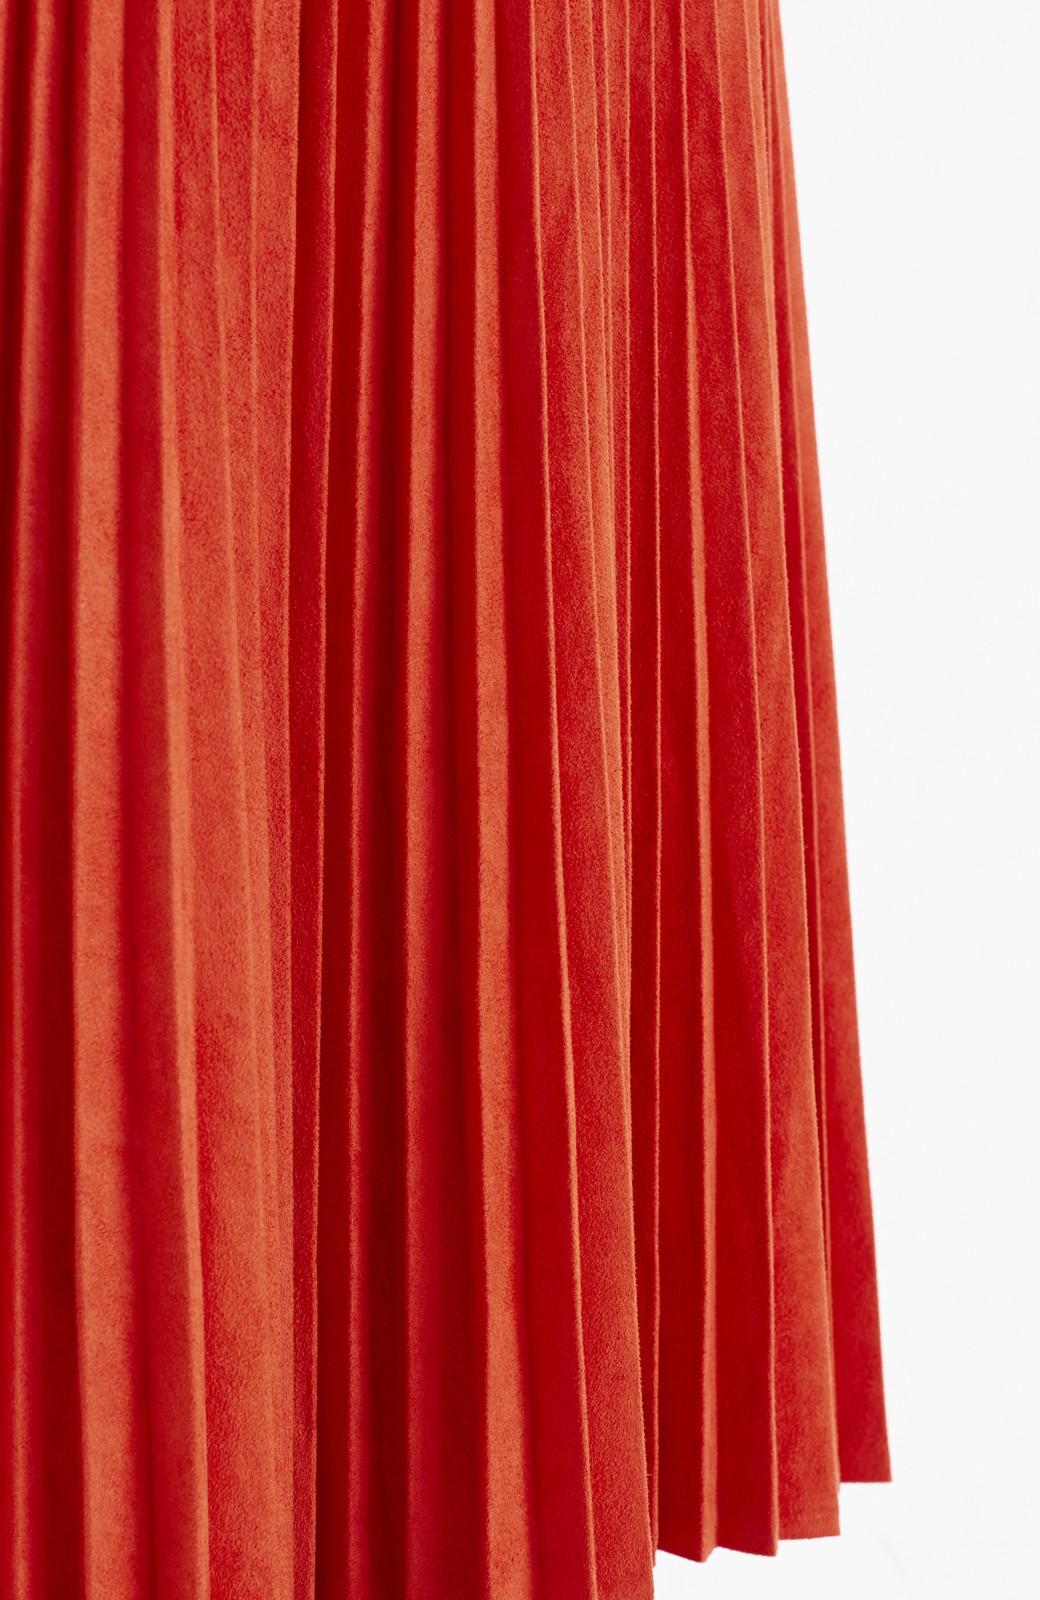 haco! 楽して女っぽい フェイクスエードのプリーツスカート  by que made me <オレンジ系その他>の商品写真3